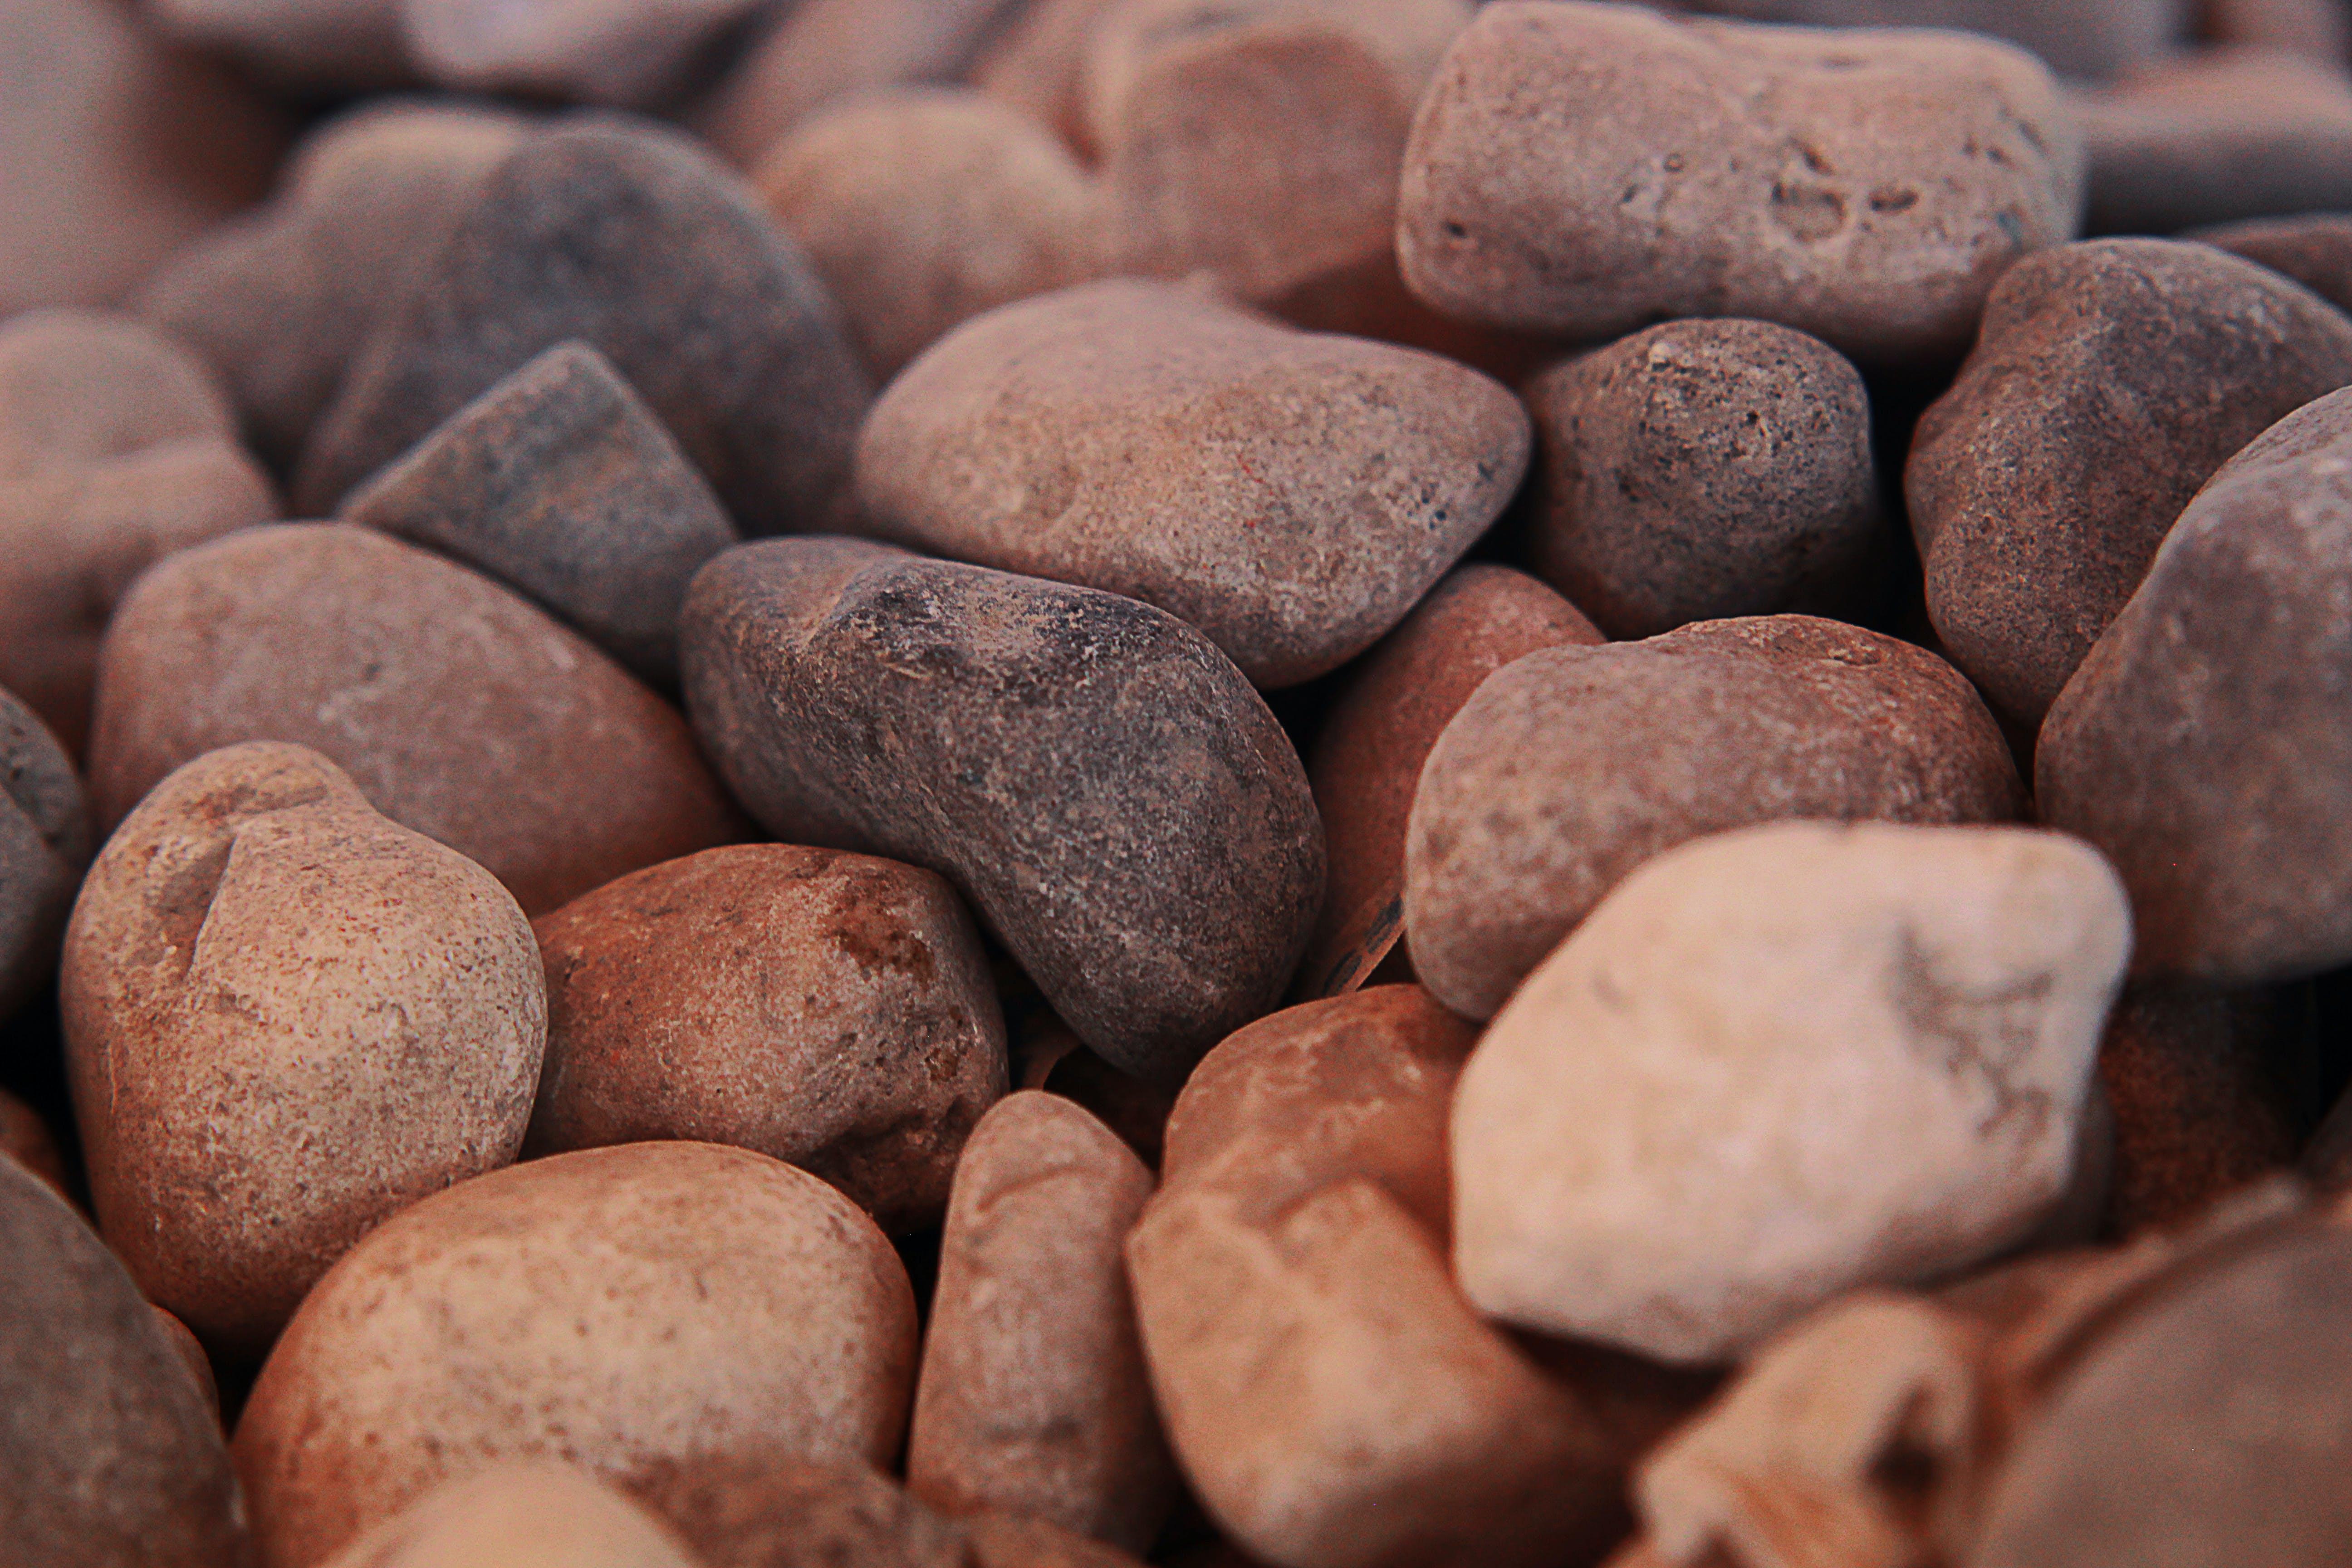 Closeup Photo of Rocks